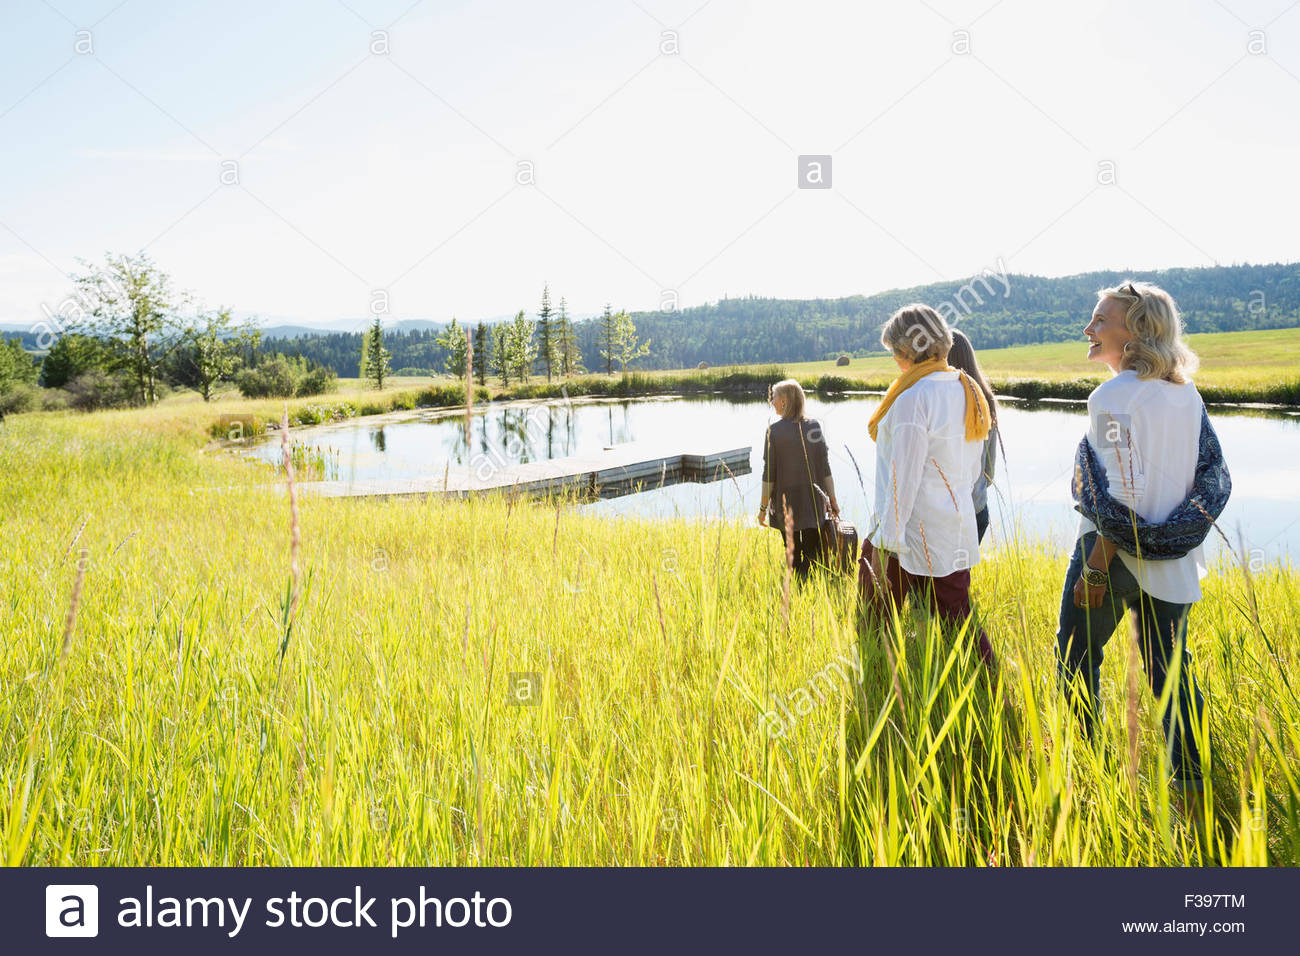 Women walking in grass near sunny lake - Stock Image